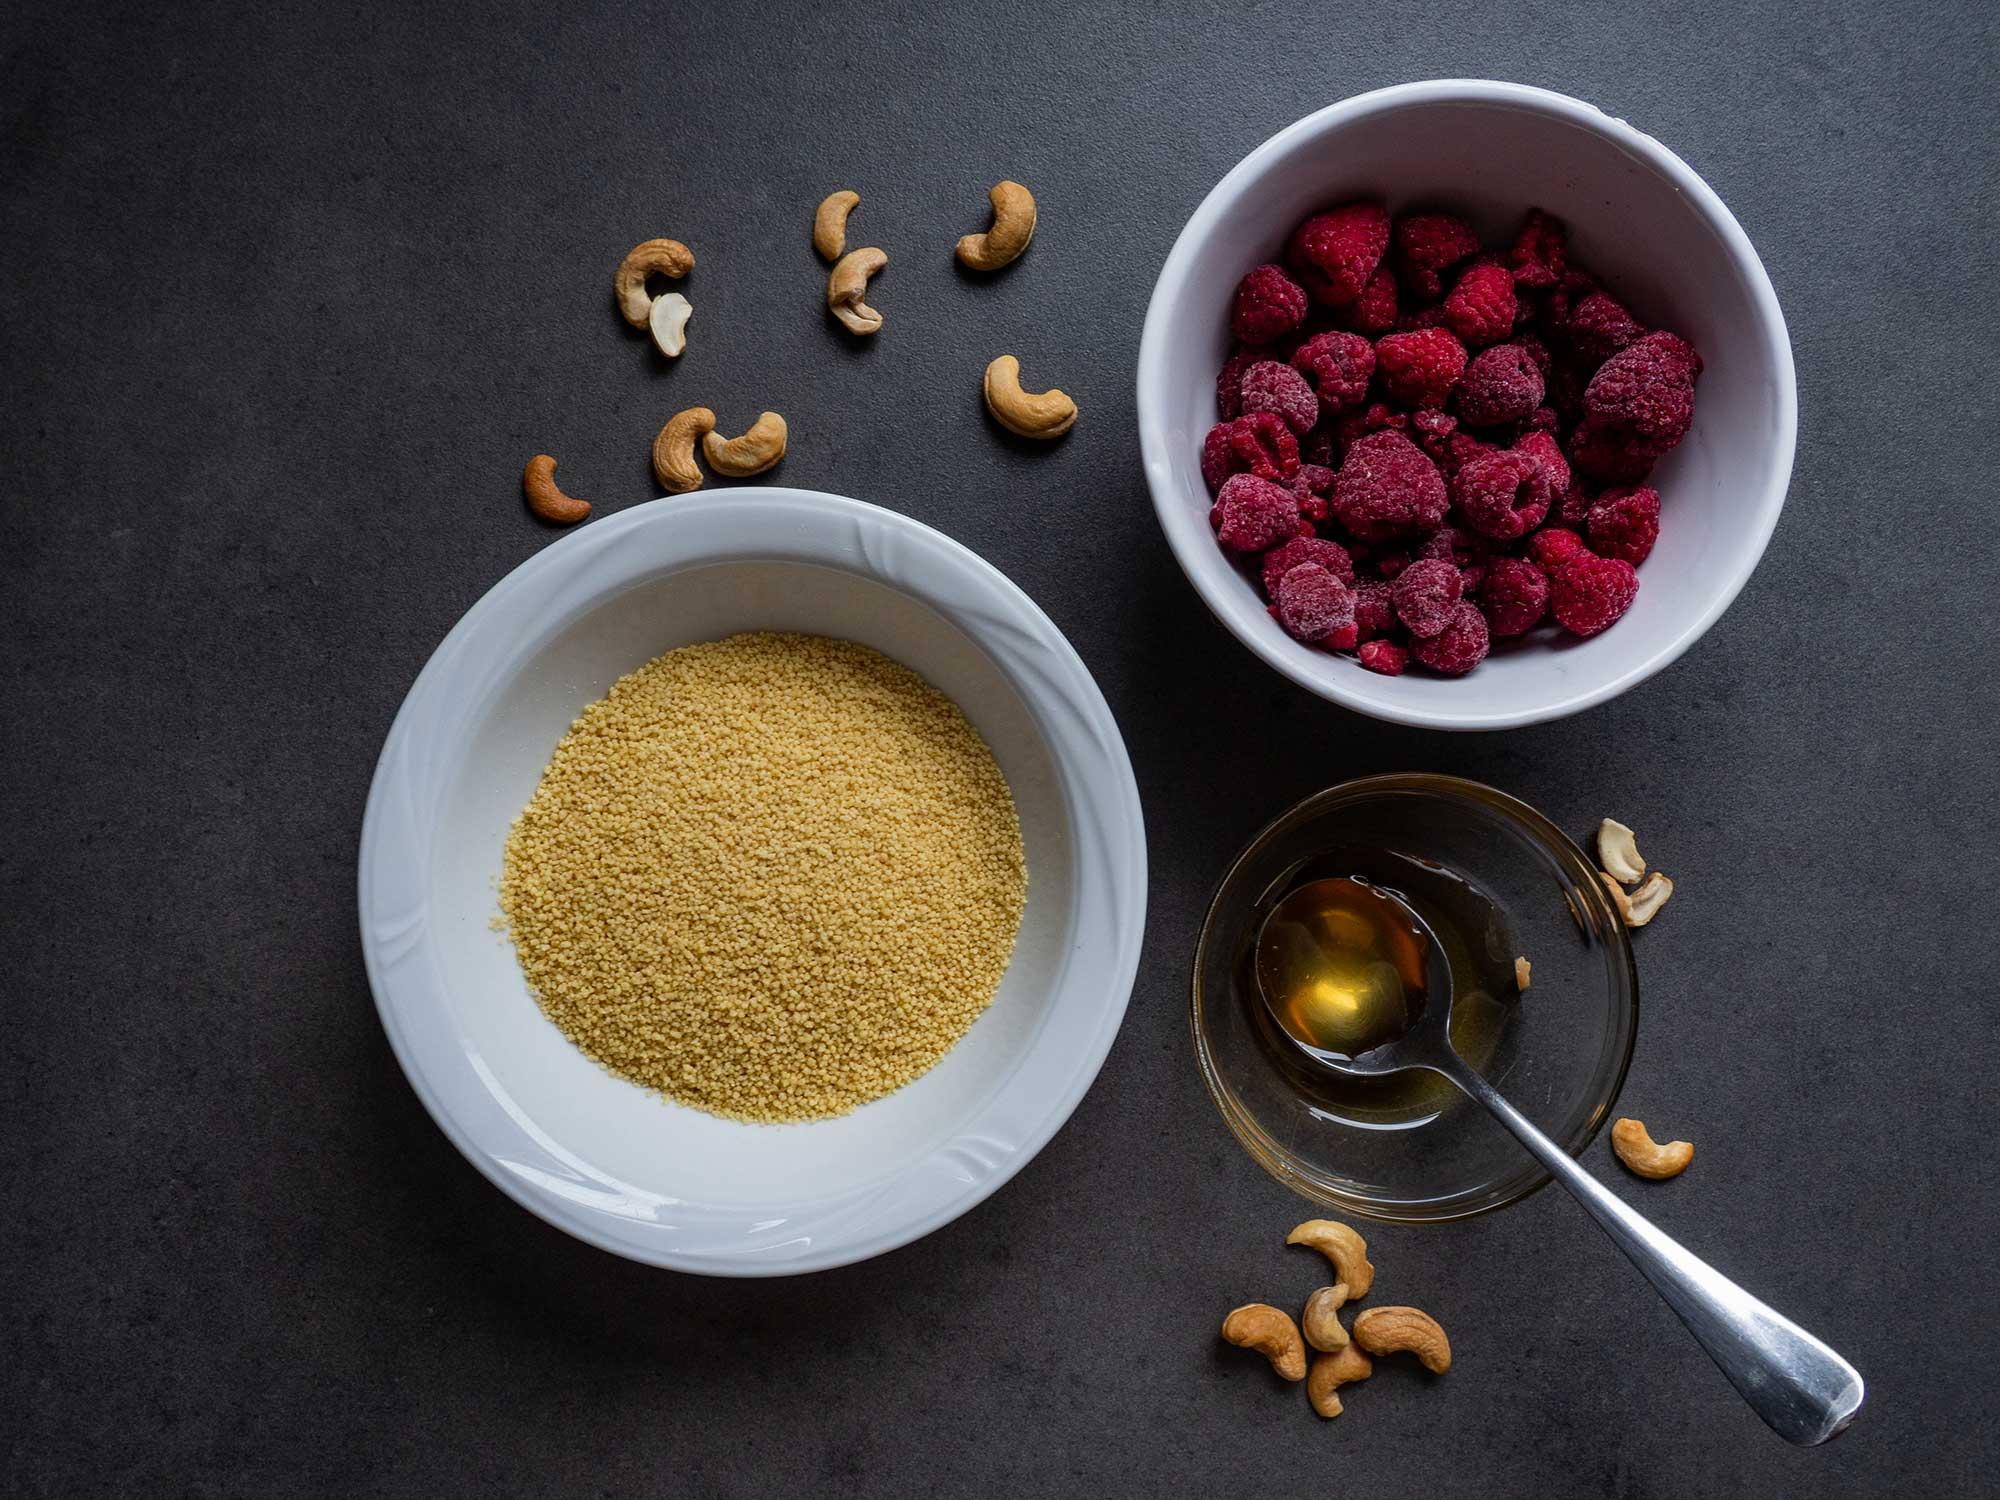 Raspberry couscous